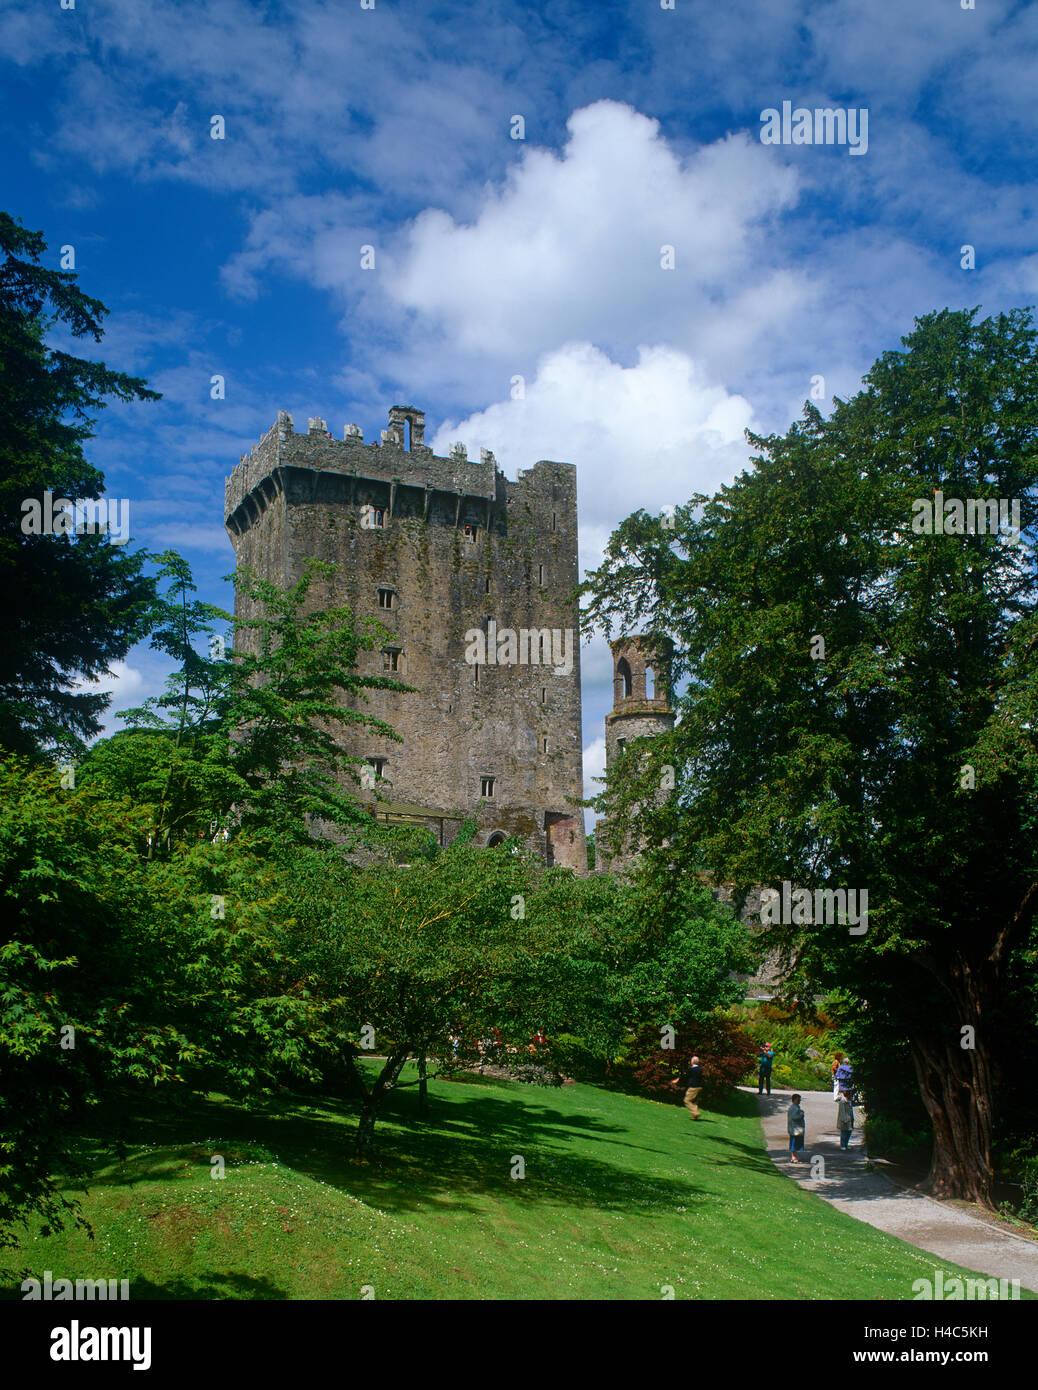 Blarney Castle, County Cork, Ireland - Stock Image